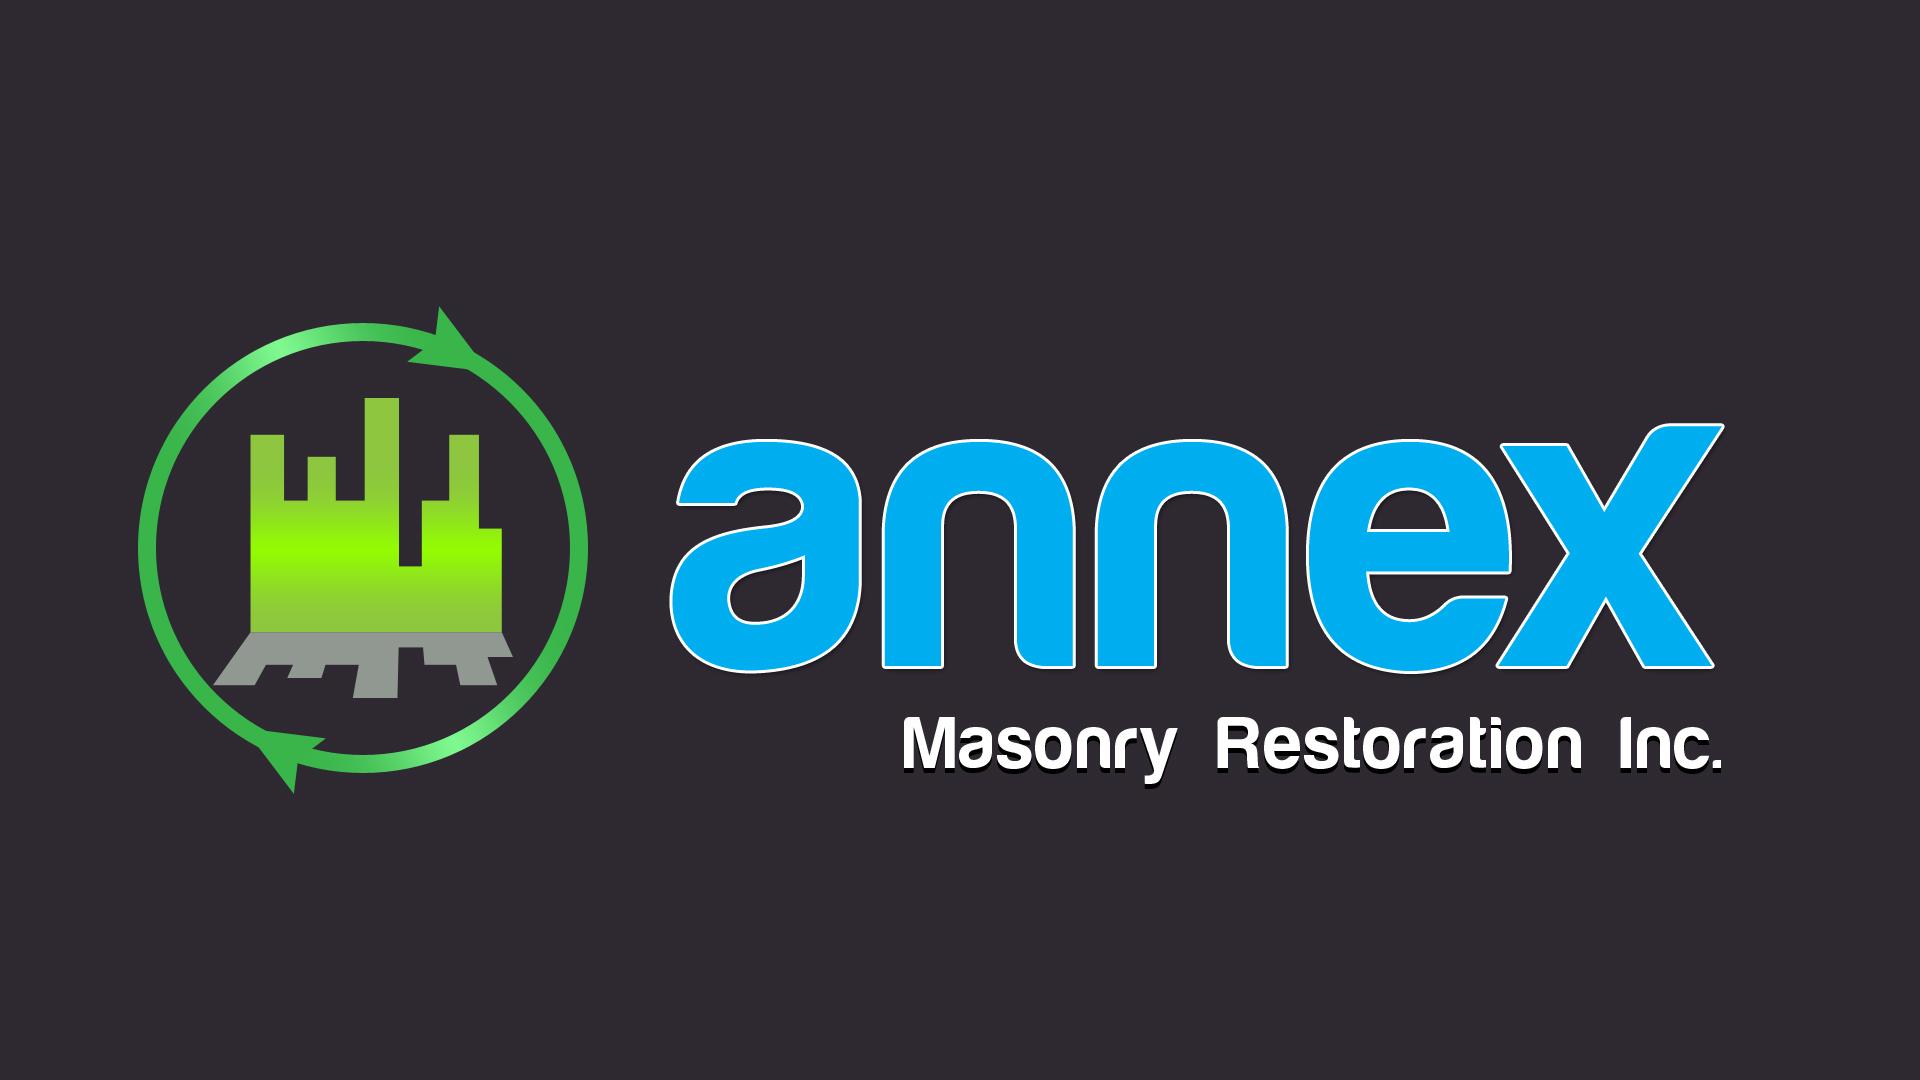 Logo Design by Ajaysinh Patil - Entry No. 45 in the Logo Design Contest Annex Masonry Restoration Inc. Logo Design.